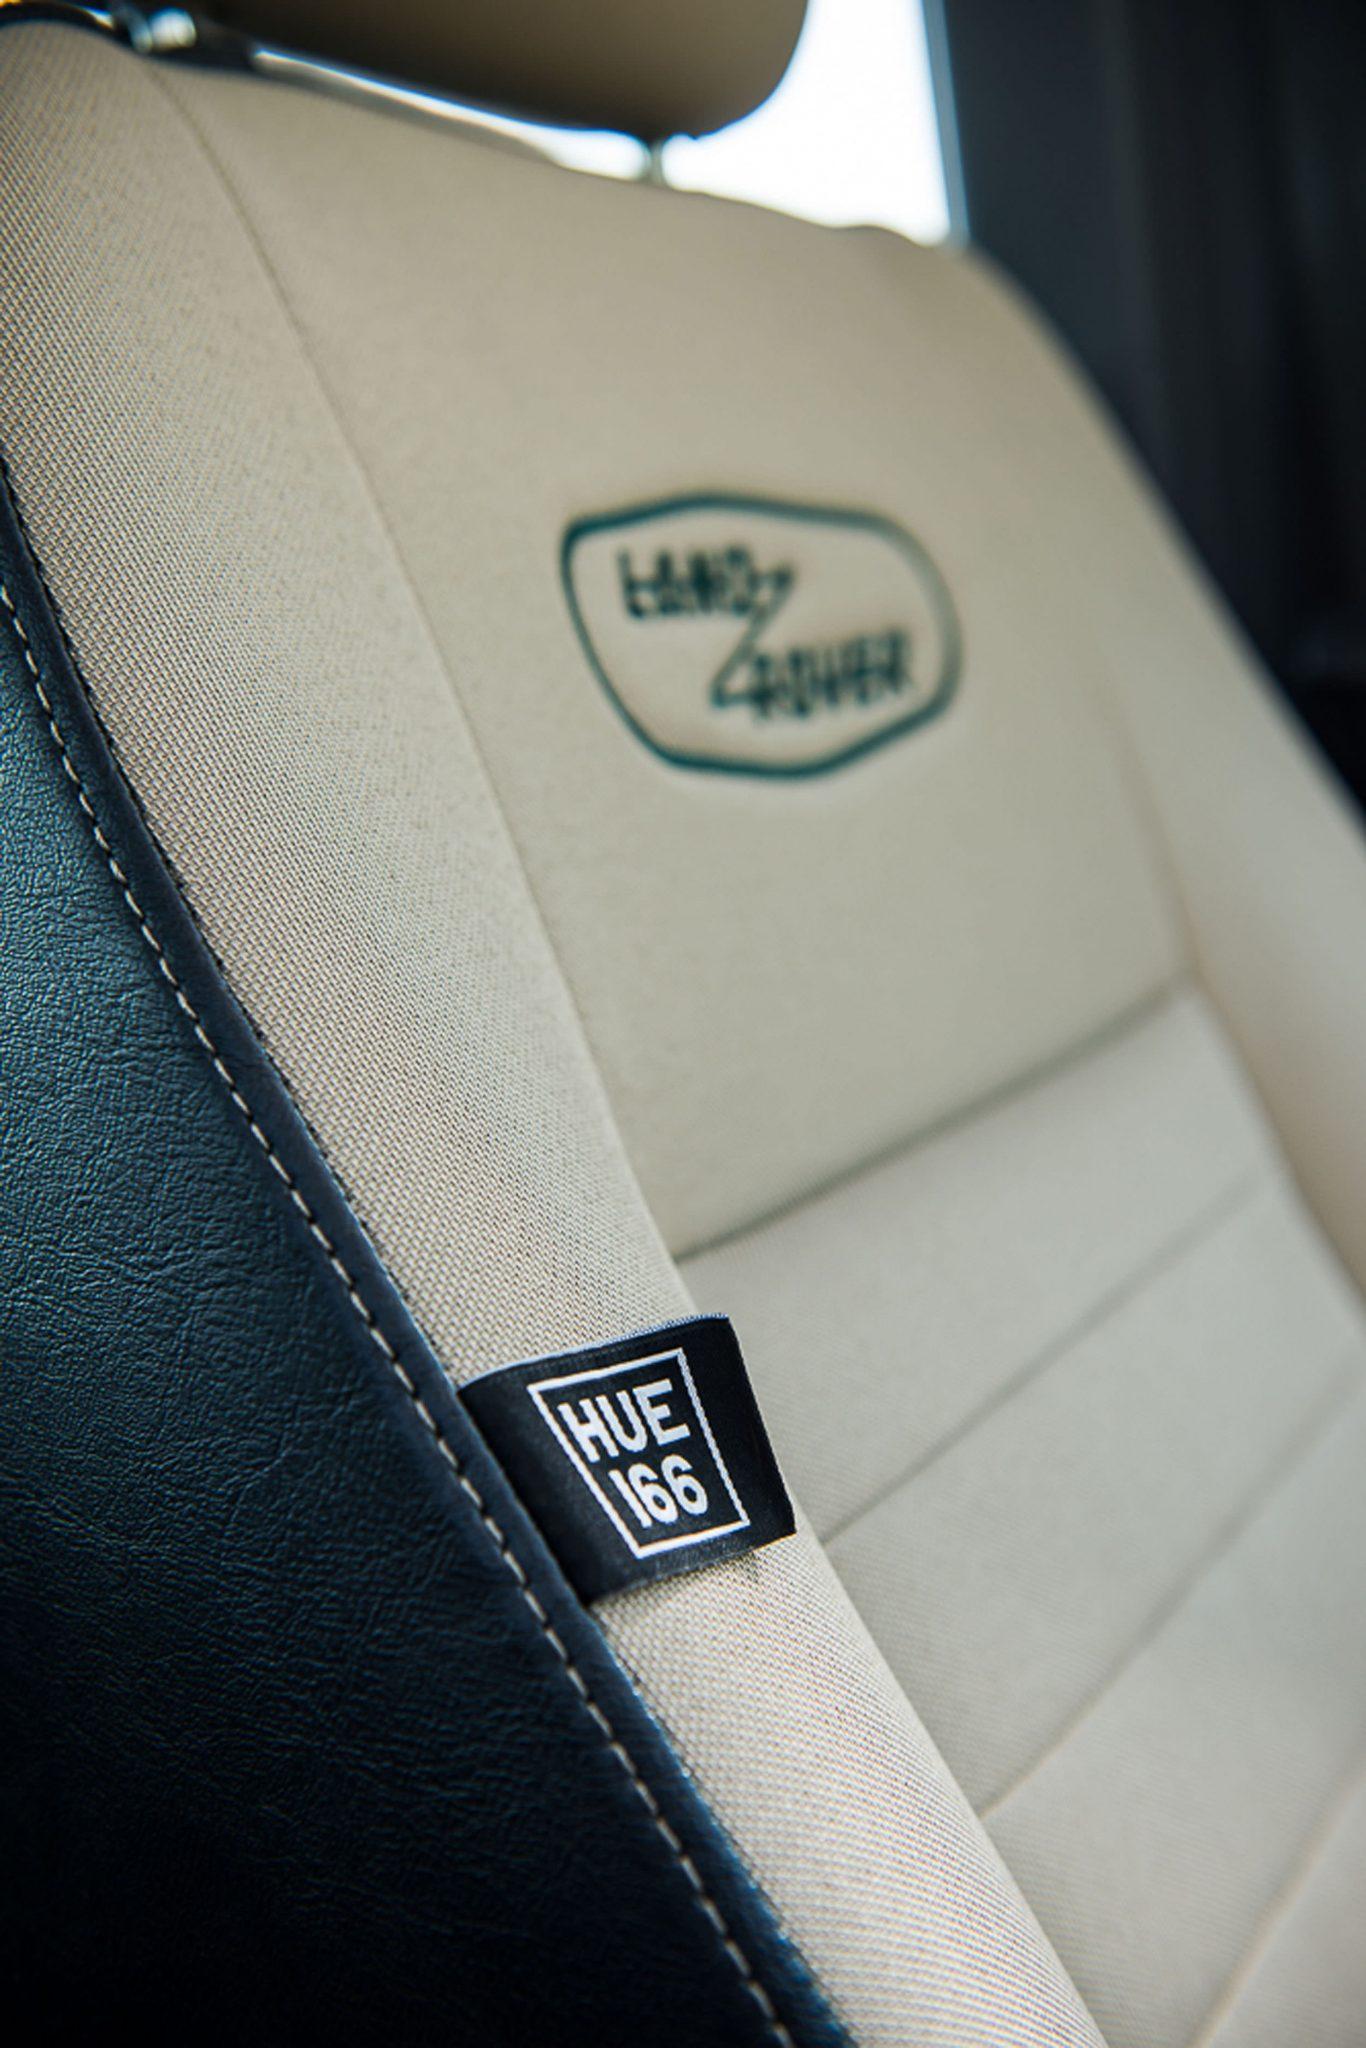 Rowan Atkinson's Land Rover Defender 10 - Rowan Atkinson's Land Rover Defender